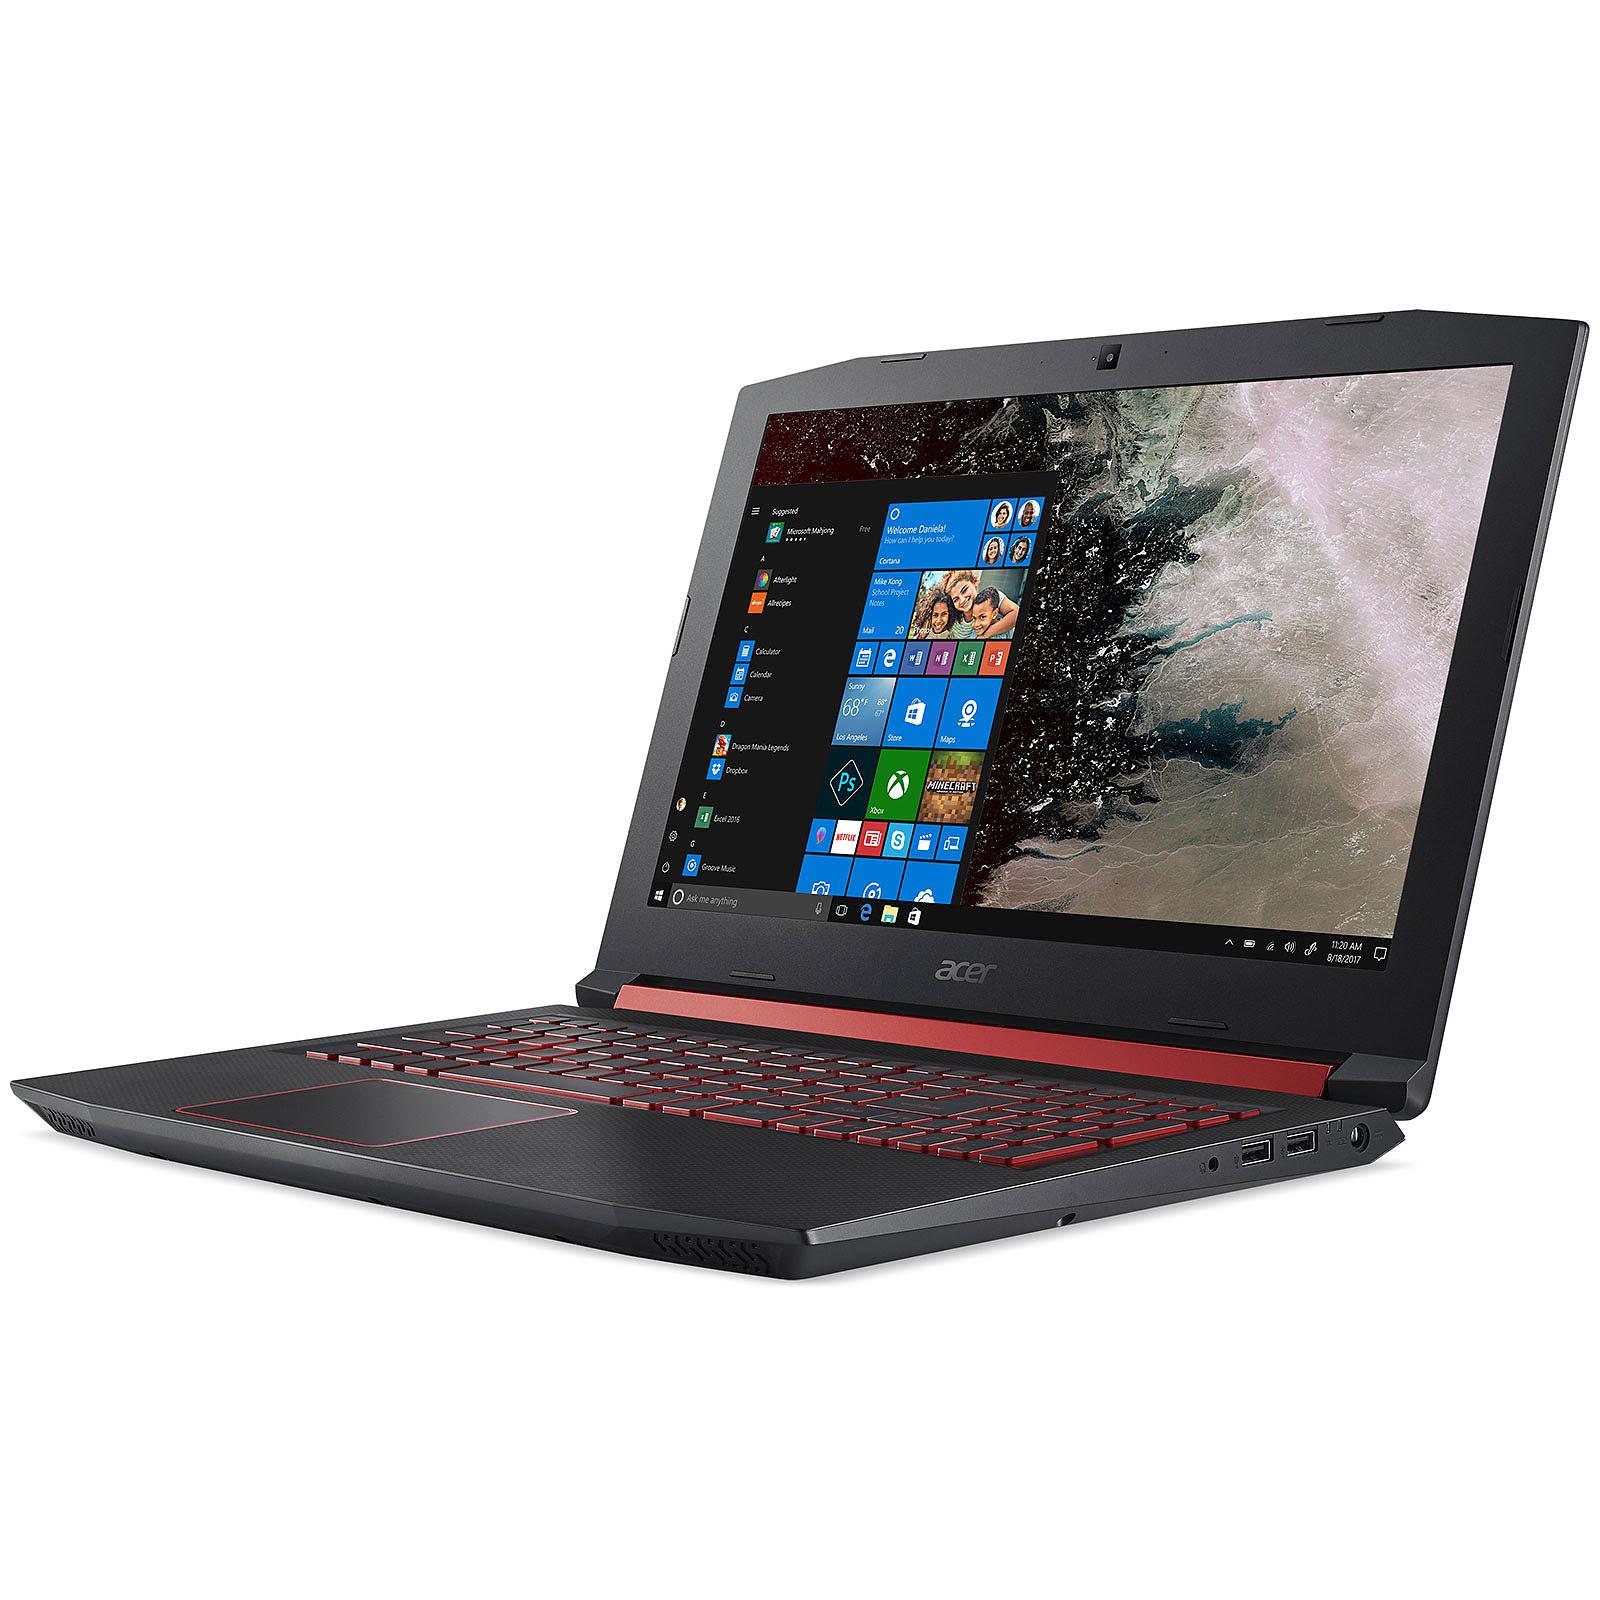 Acer NH.Q3XEF.001 - PC portable Acer - Cybertek.fr - 4